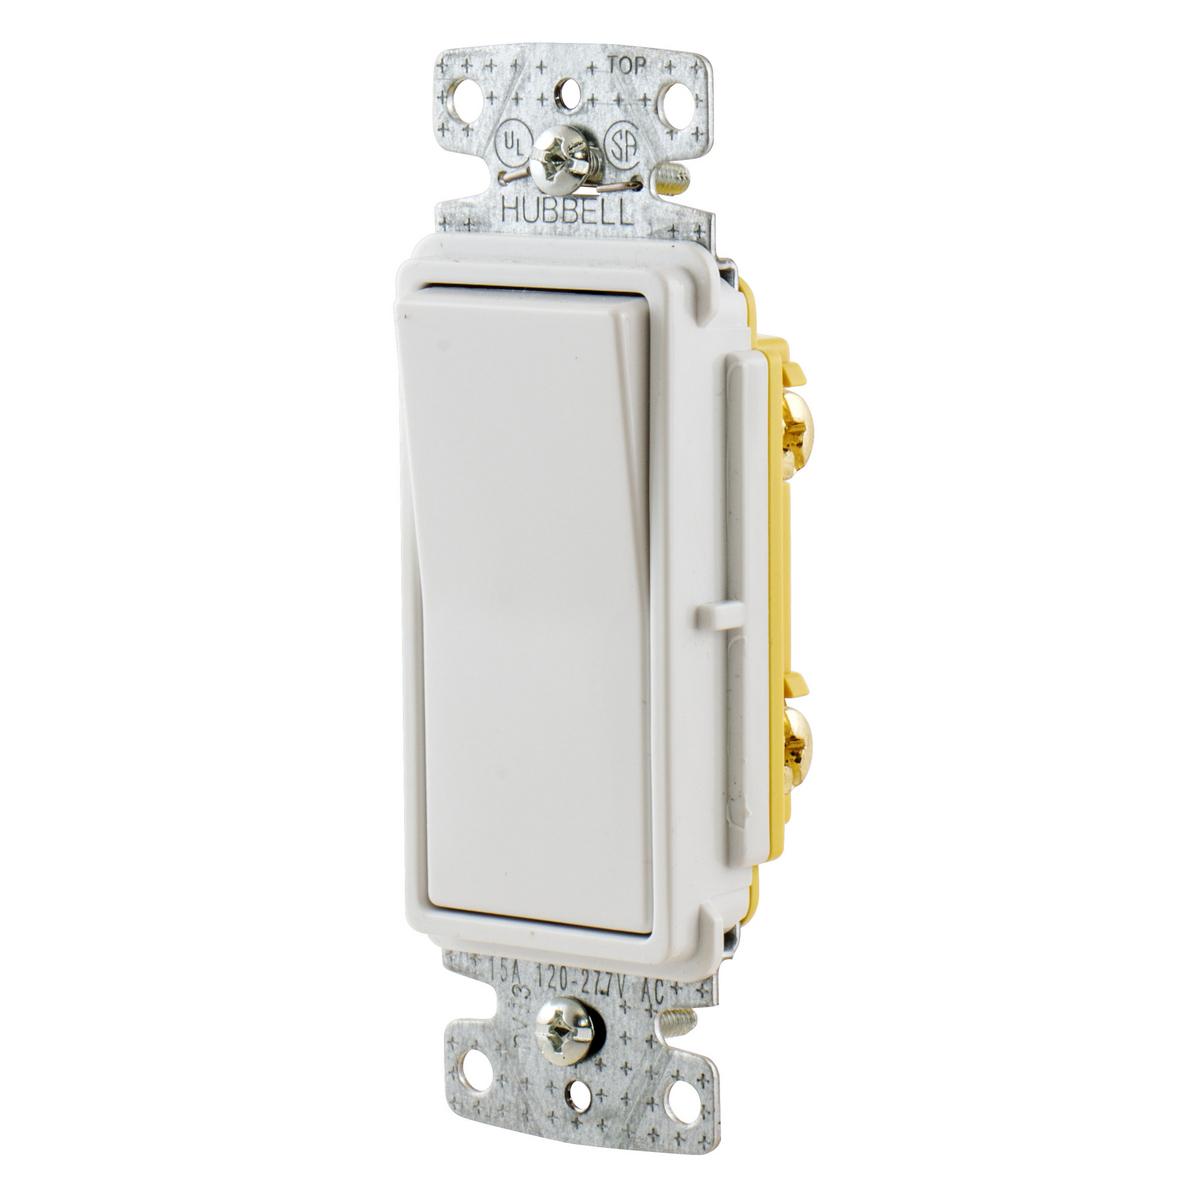 Rsd115w Brand Wiring Device Kellems Light Switch Ac Wbp Prodimage Np26w Angle Front